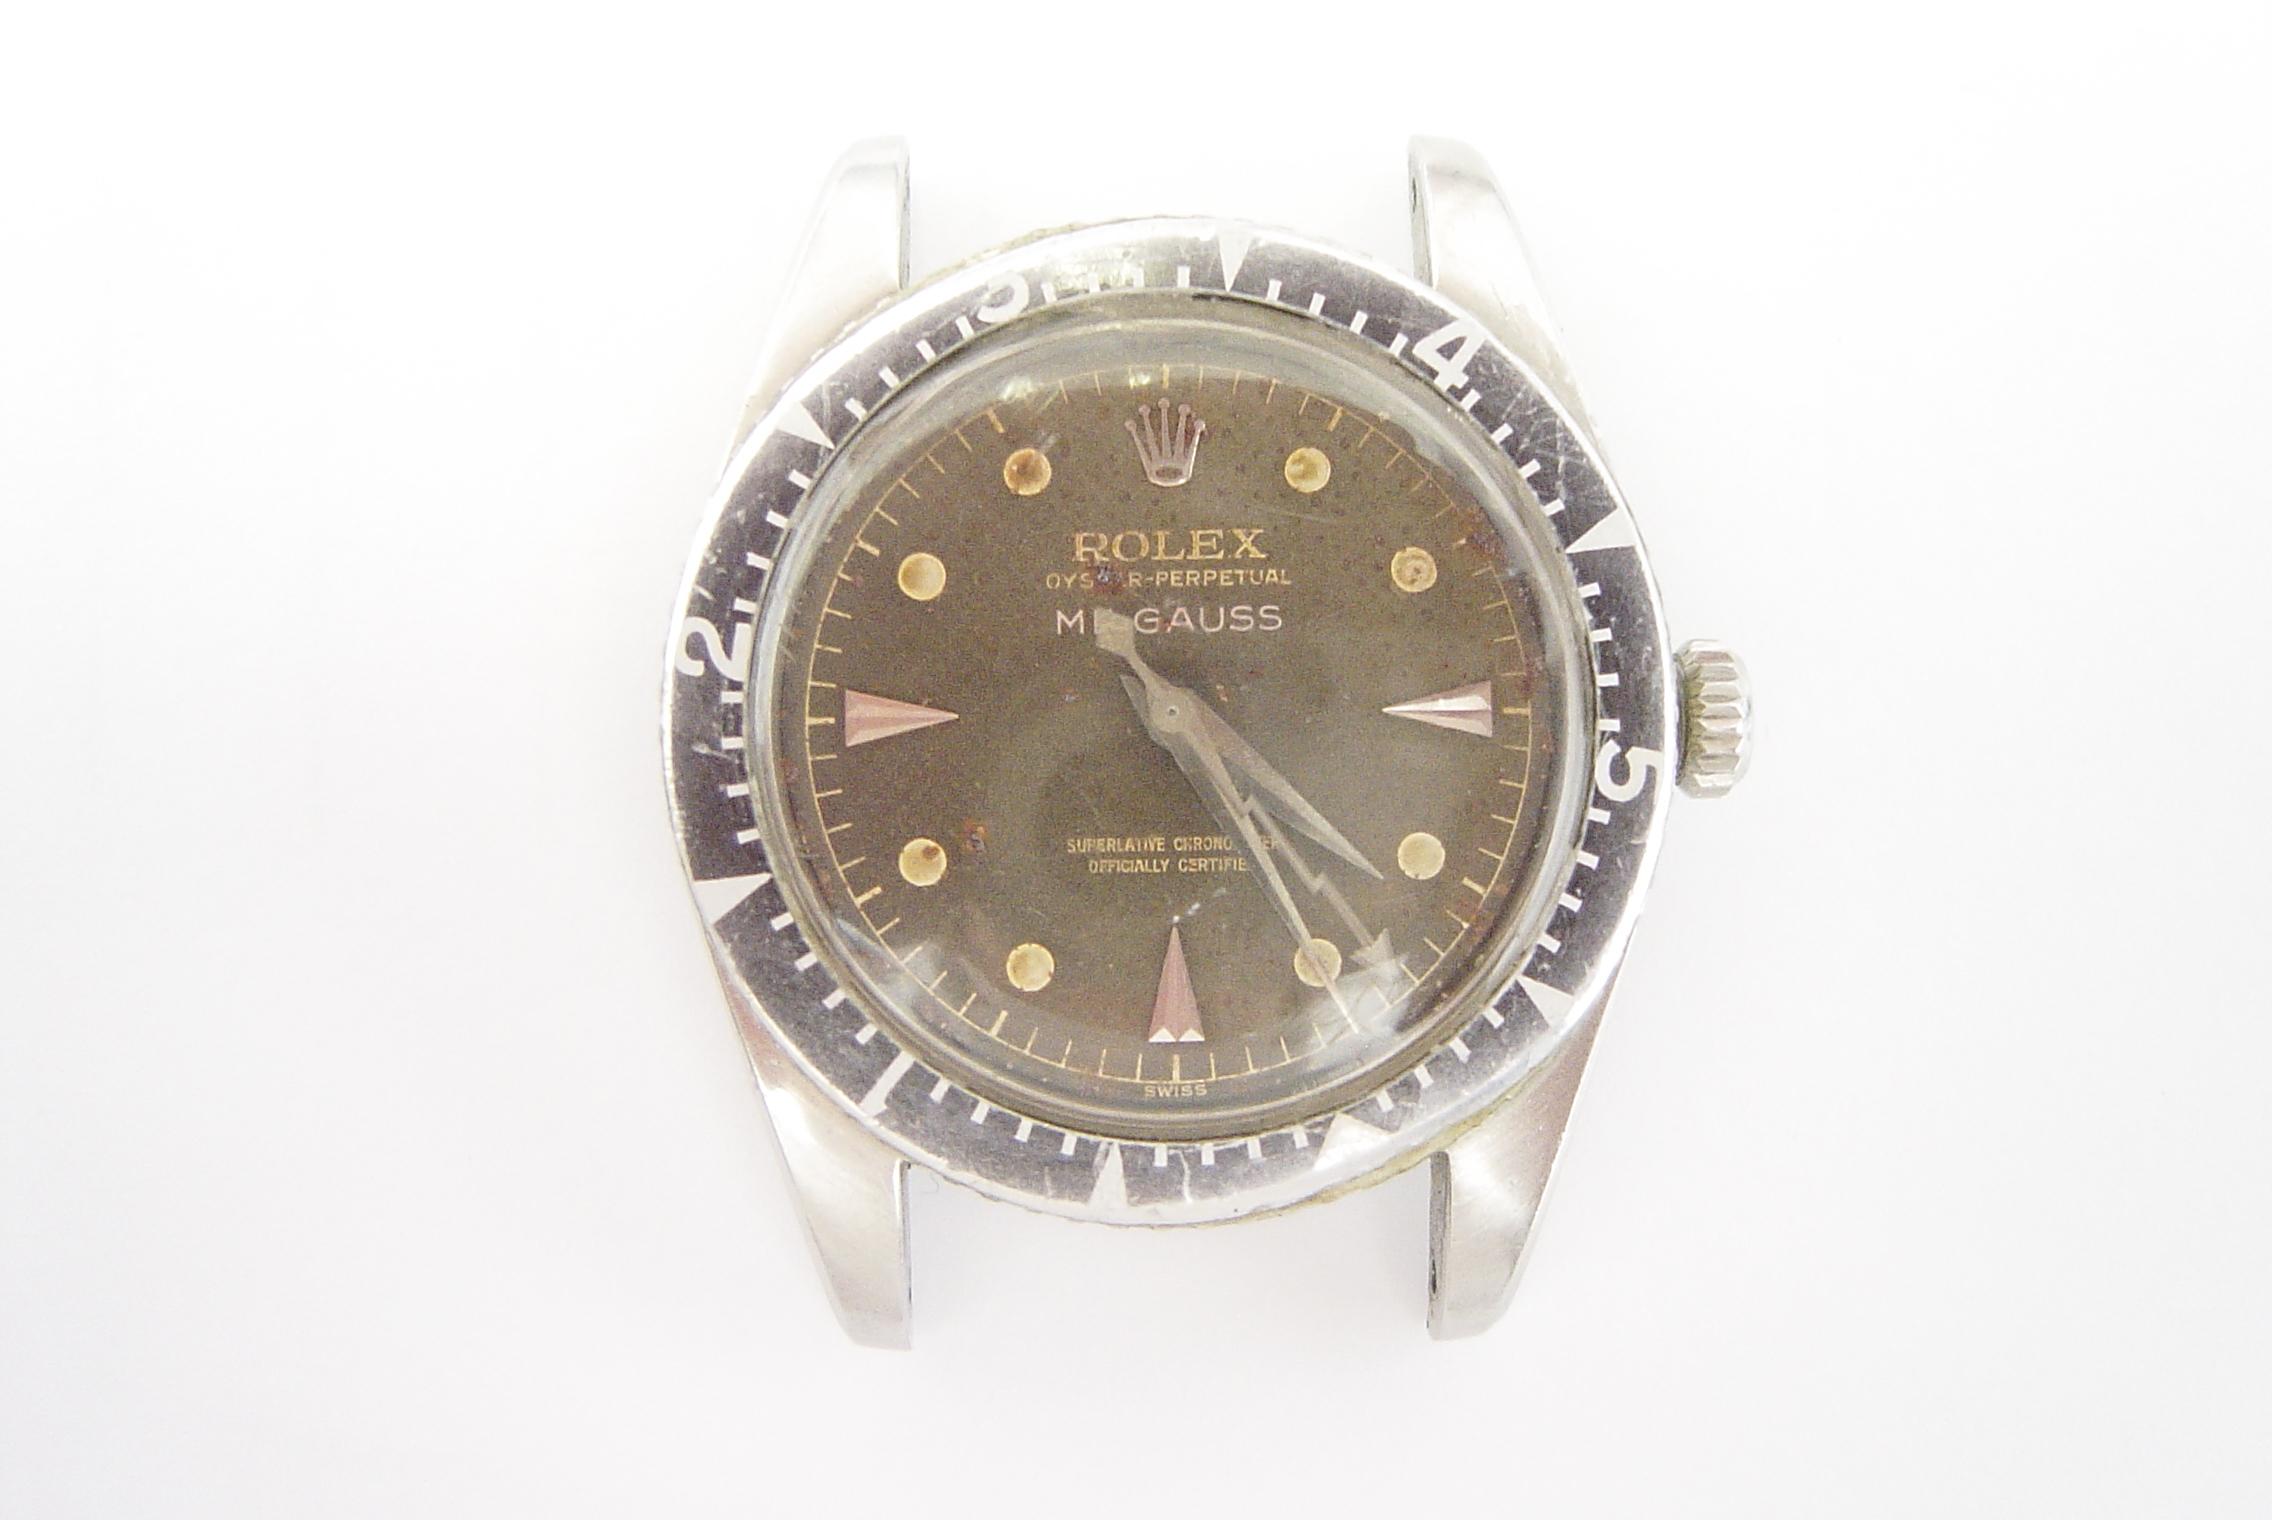 6541 Rolex Milgauss